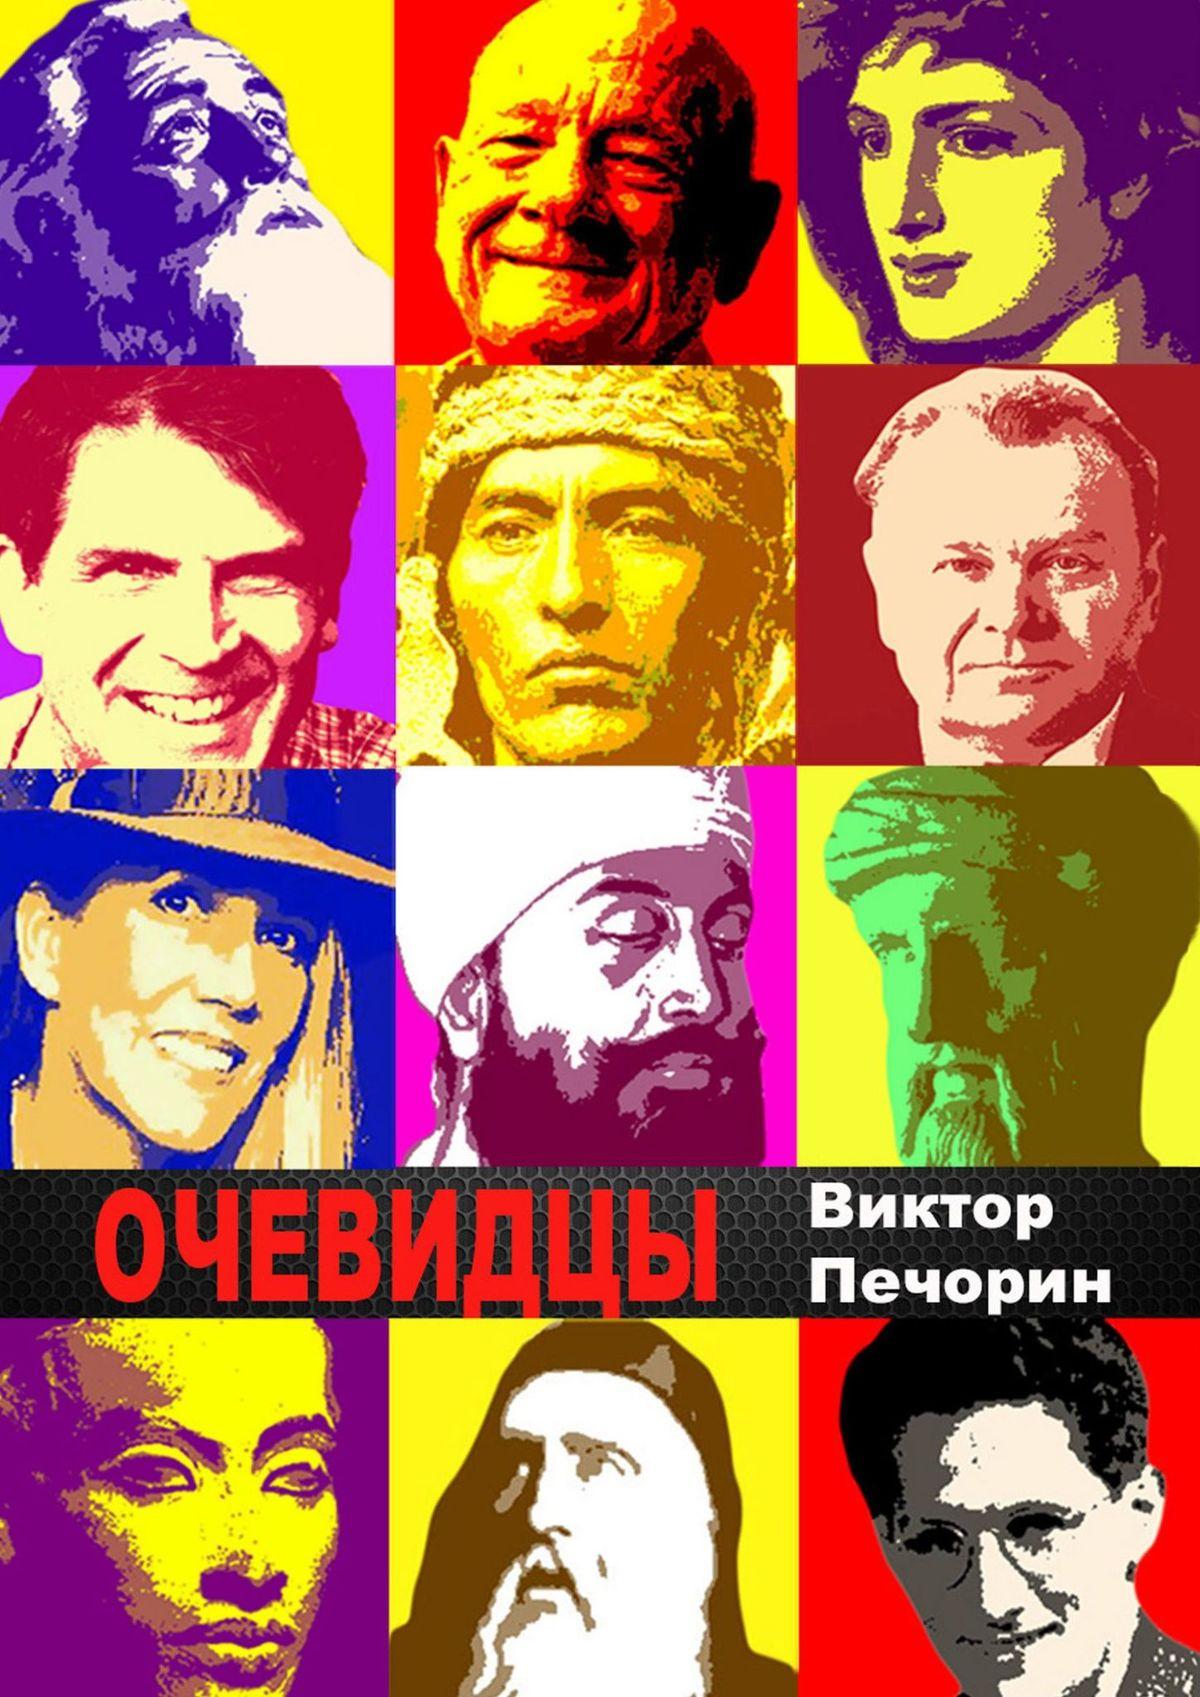 Виктор Печорин Очевидцы